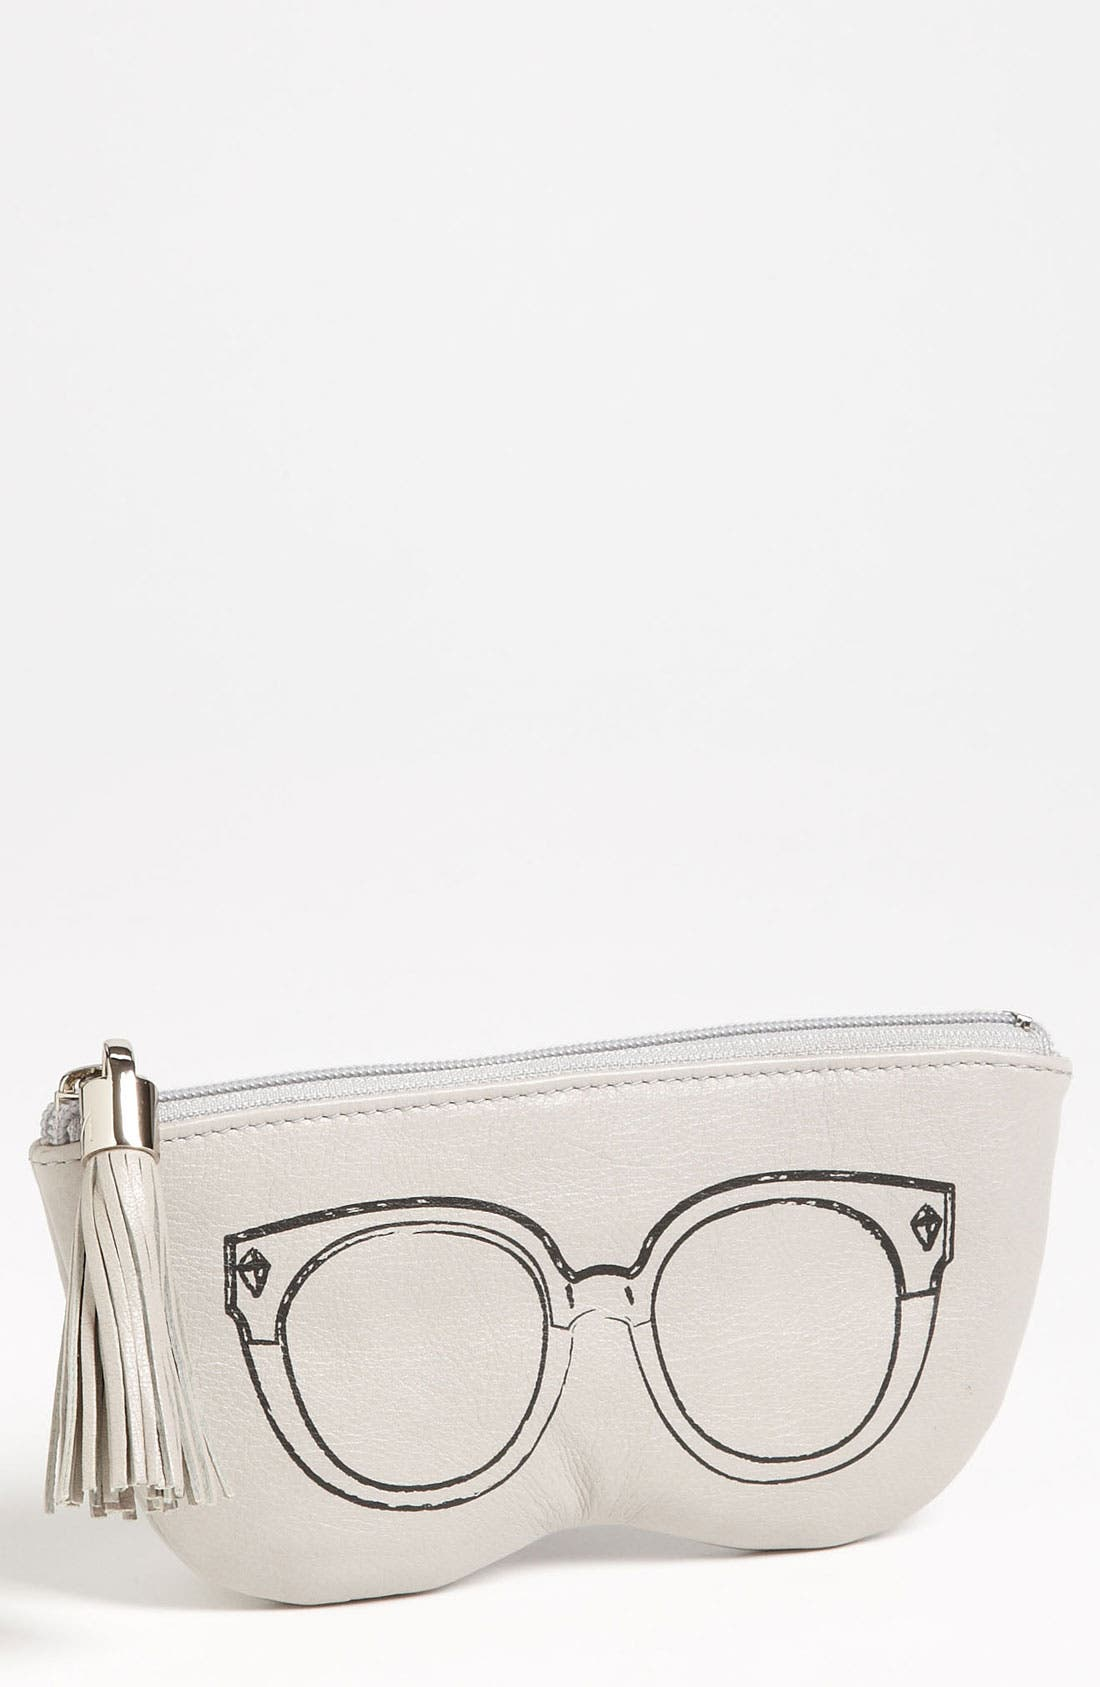 Leather Sunglasses Case,                             Main thumbnail 1, color,                             020